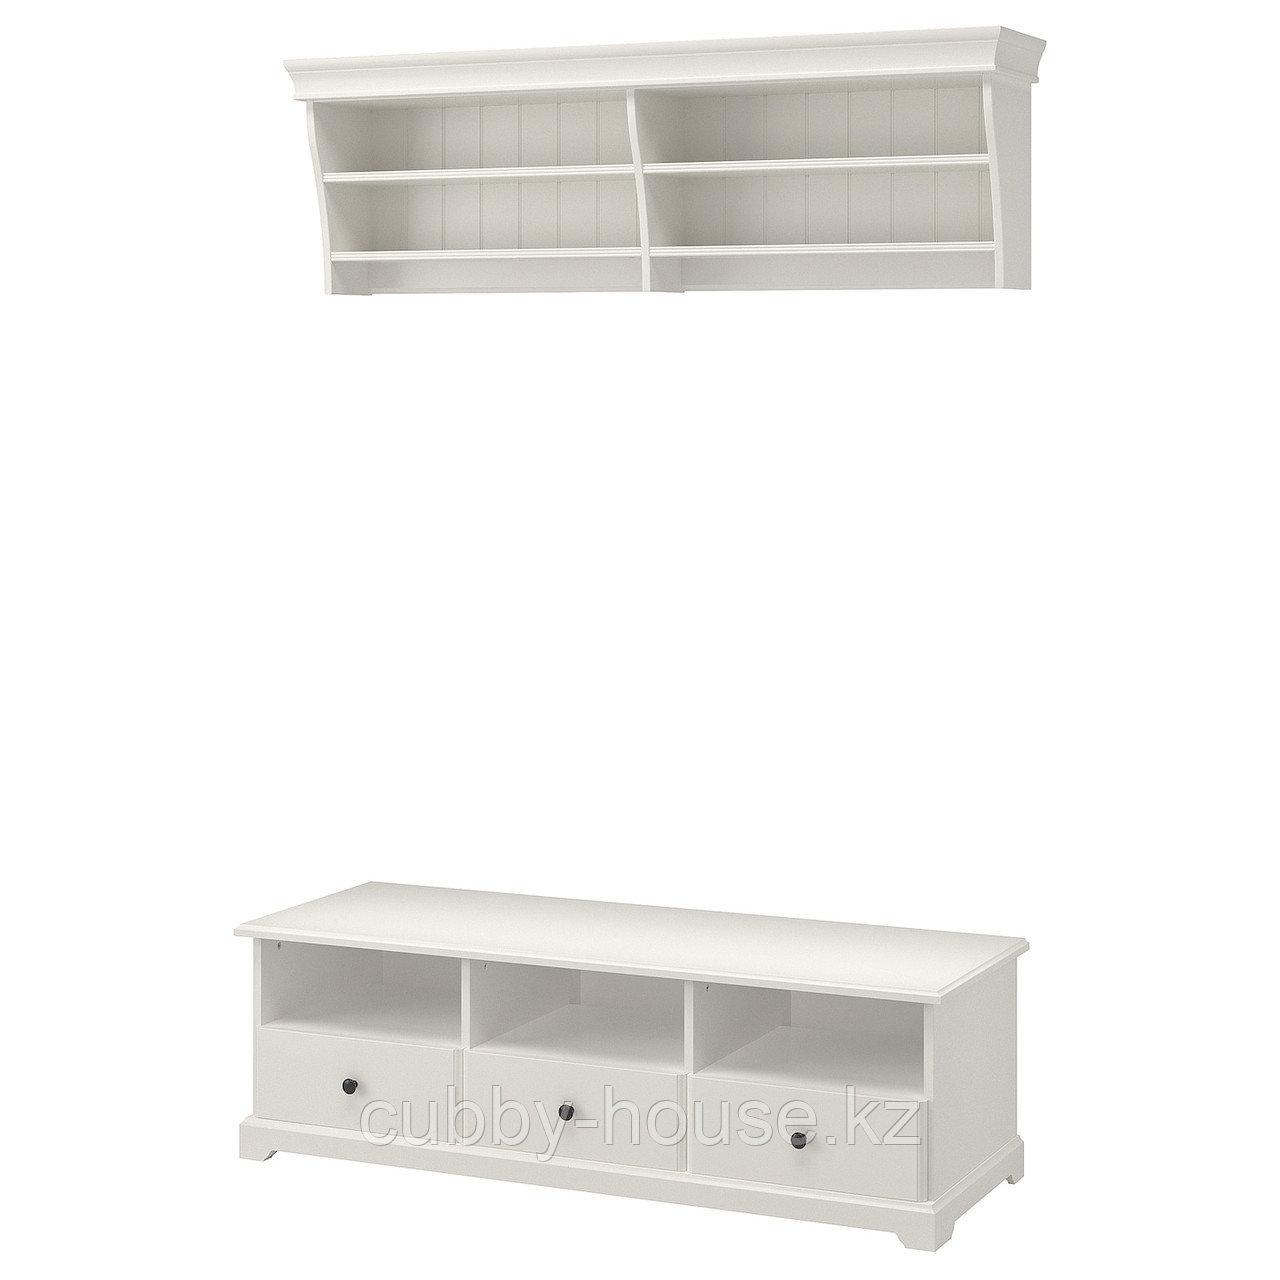 ЛИАТОРП Шкаф для ТВ, комбинация, белый, 145x49 см